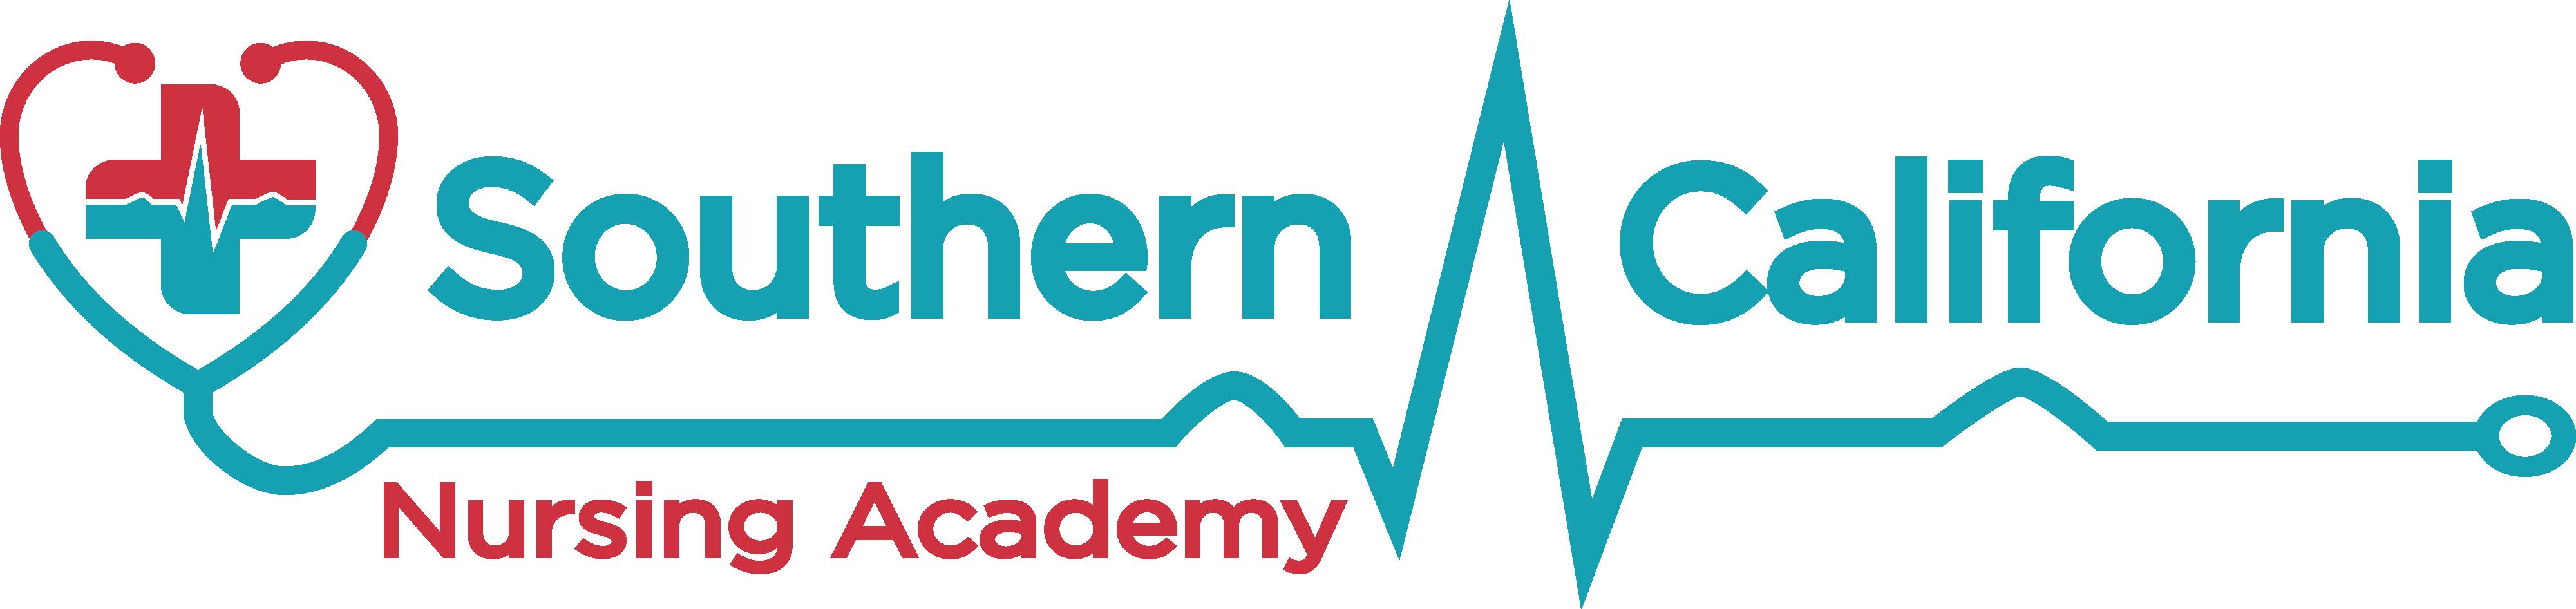 SoCal-Nursing concept 2 (Southern California Nursing Academy - CNA/NATP)